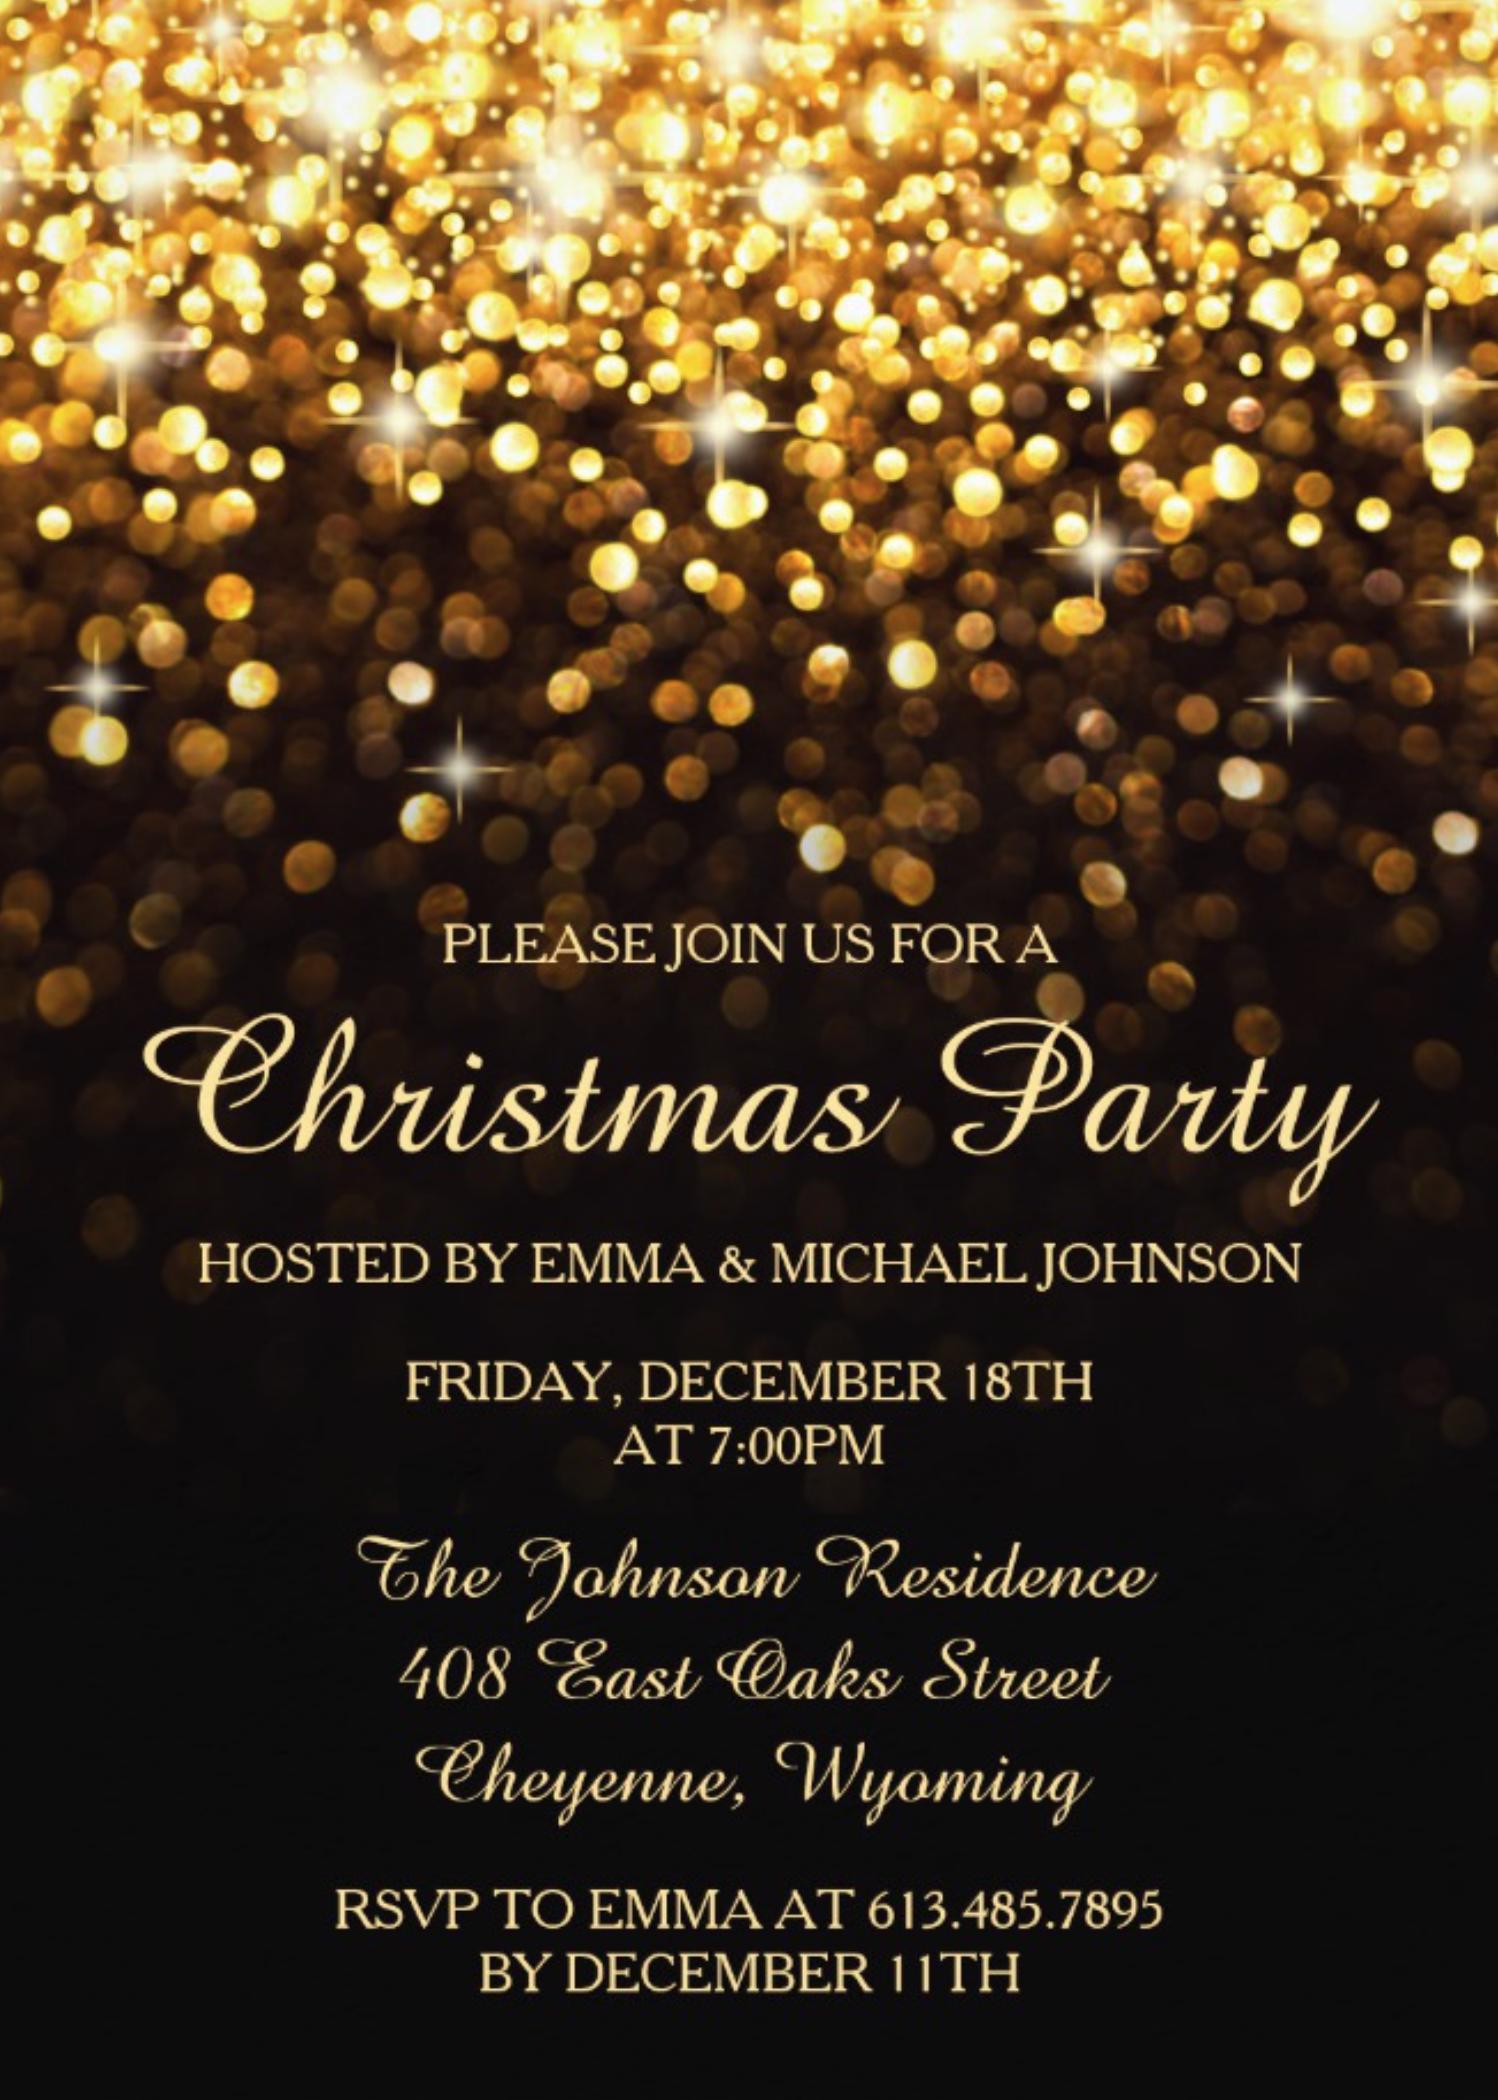 Christmas Invitation Background Gold.Elegant Christmas Party Gold Shimmering Lights Invitation